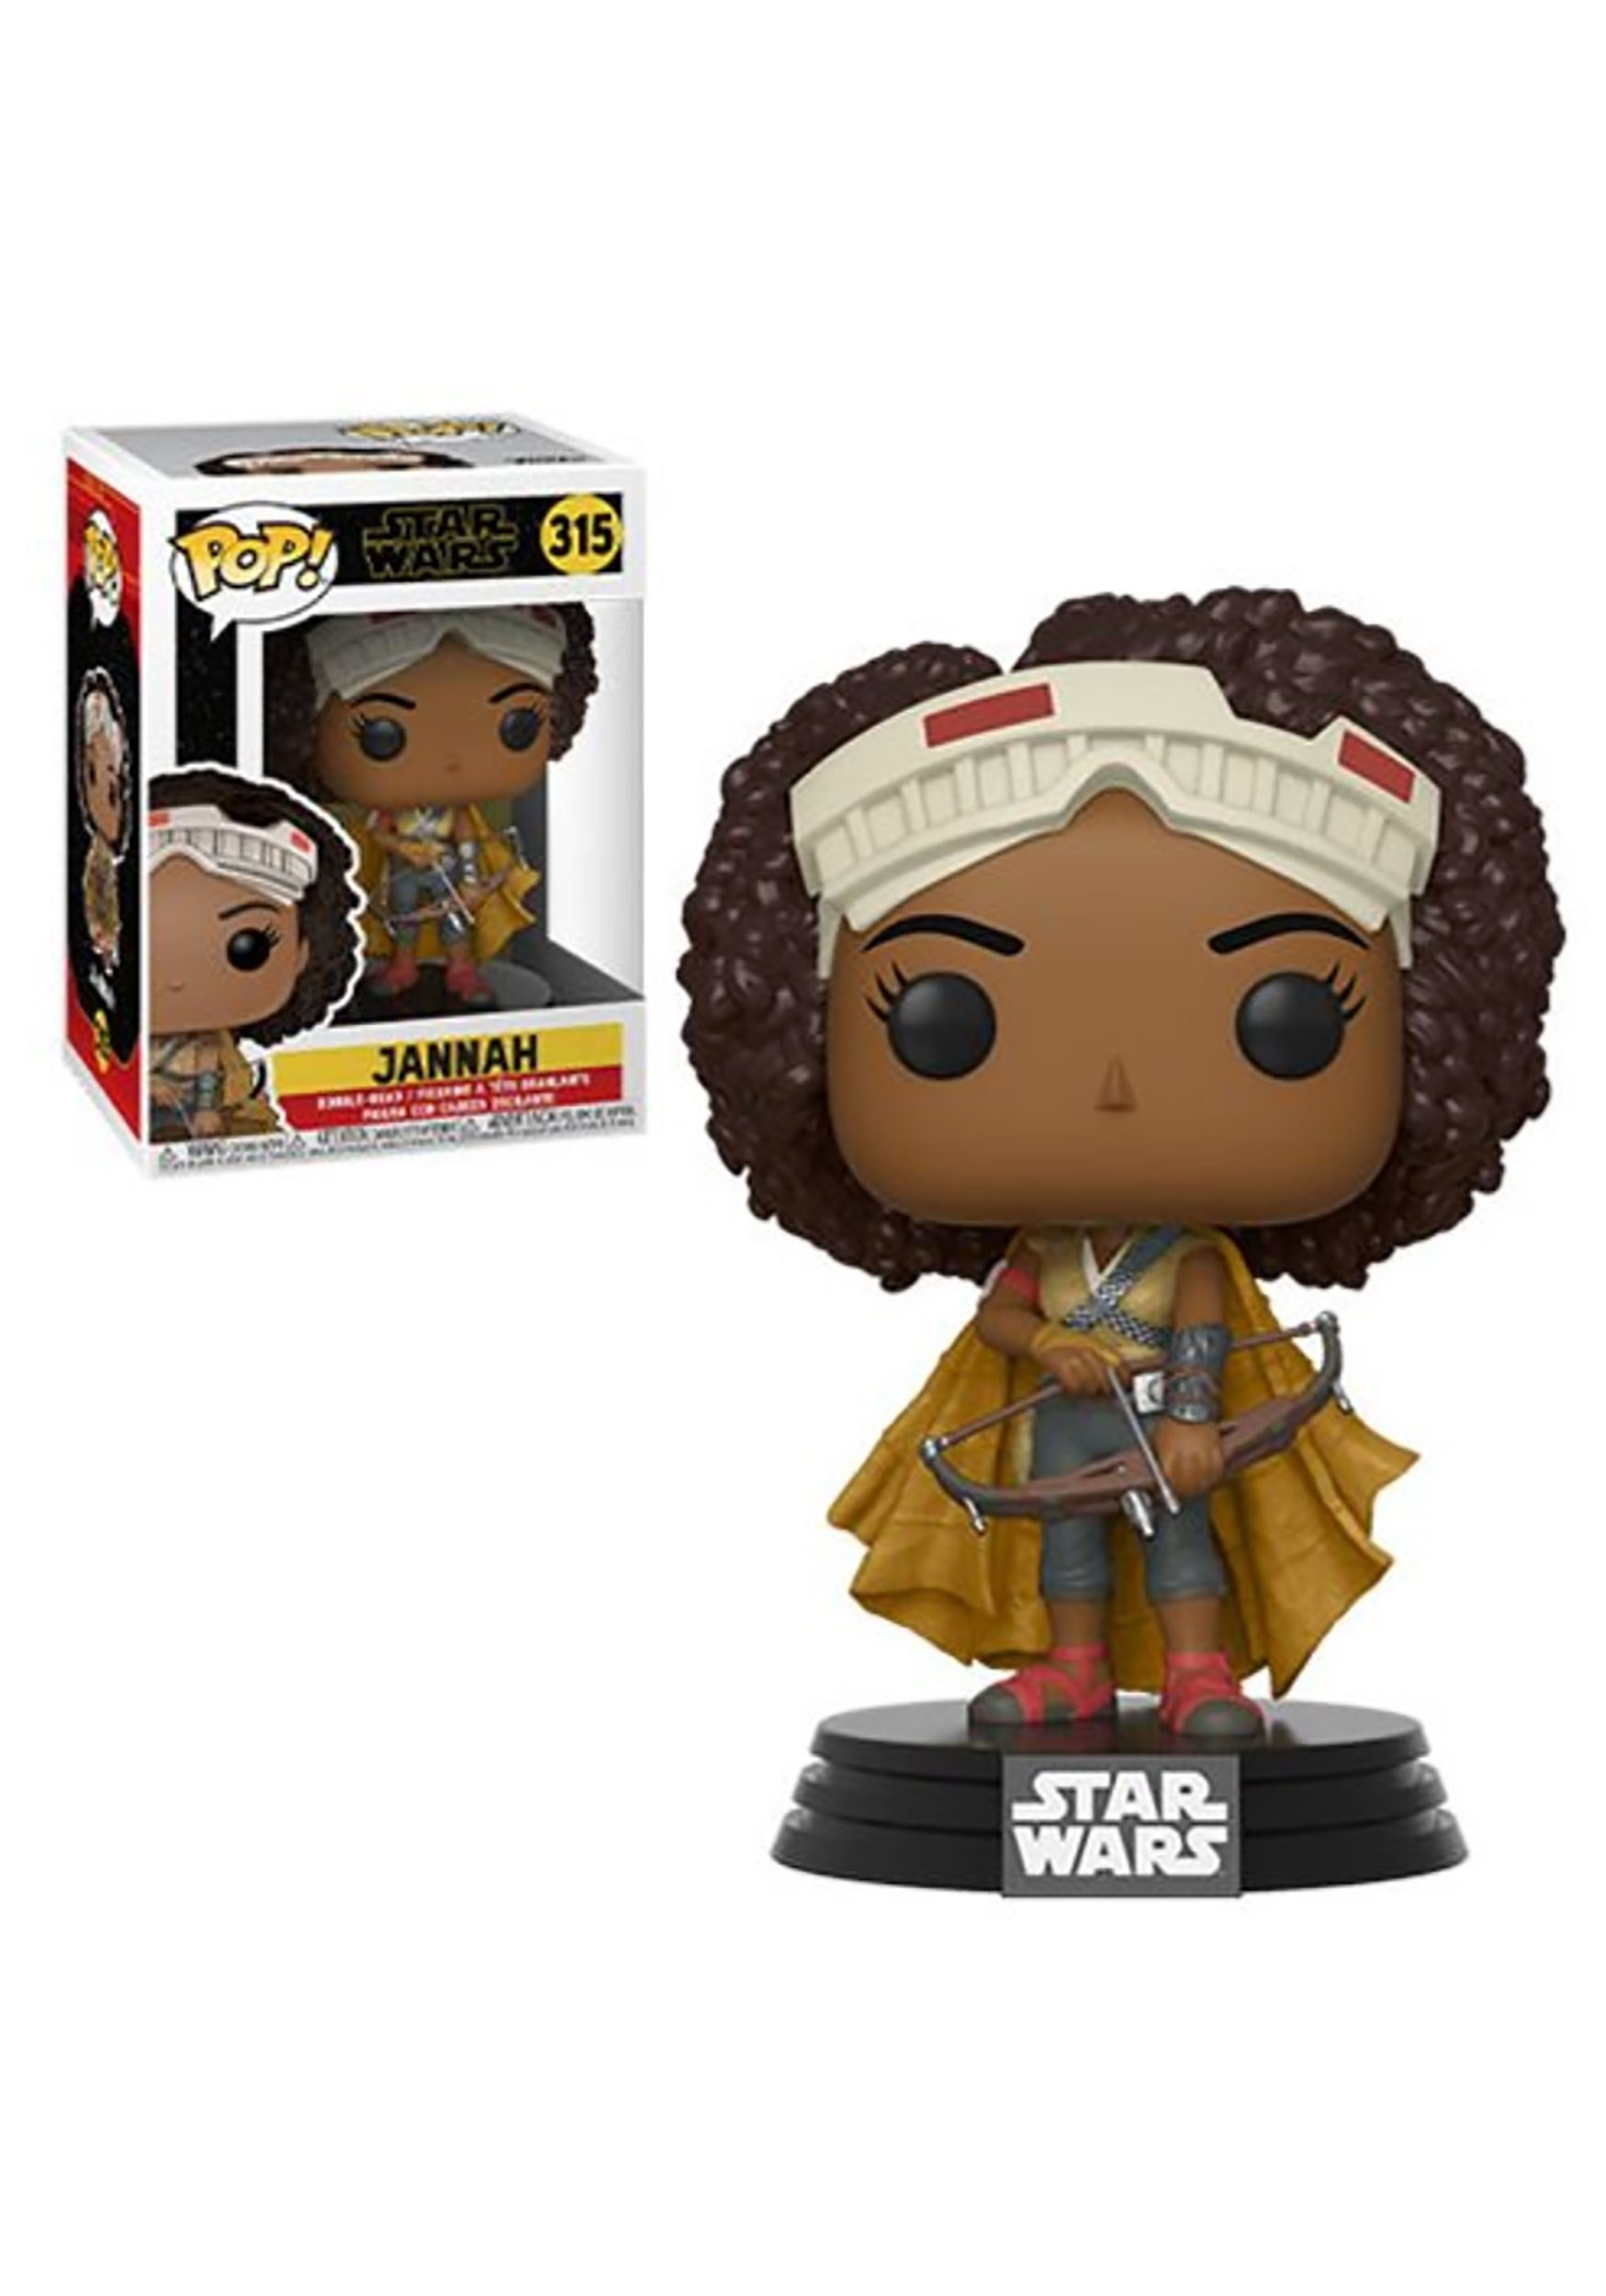 Jannah Pop Star Wars The Rise Of Skywalker Bobblehead Figure